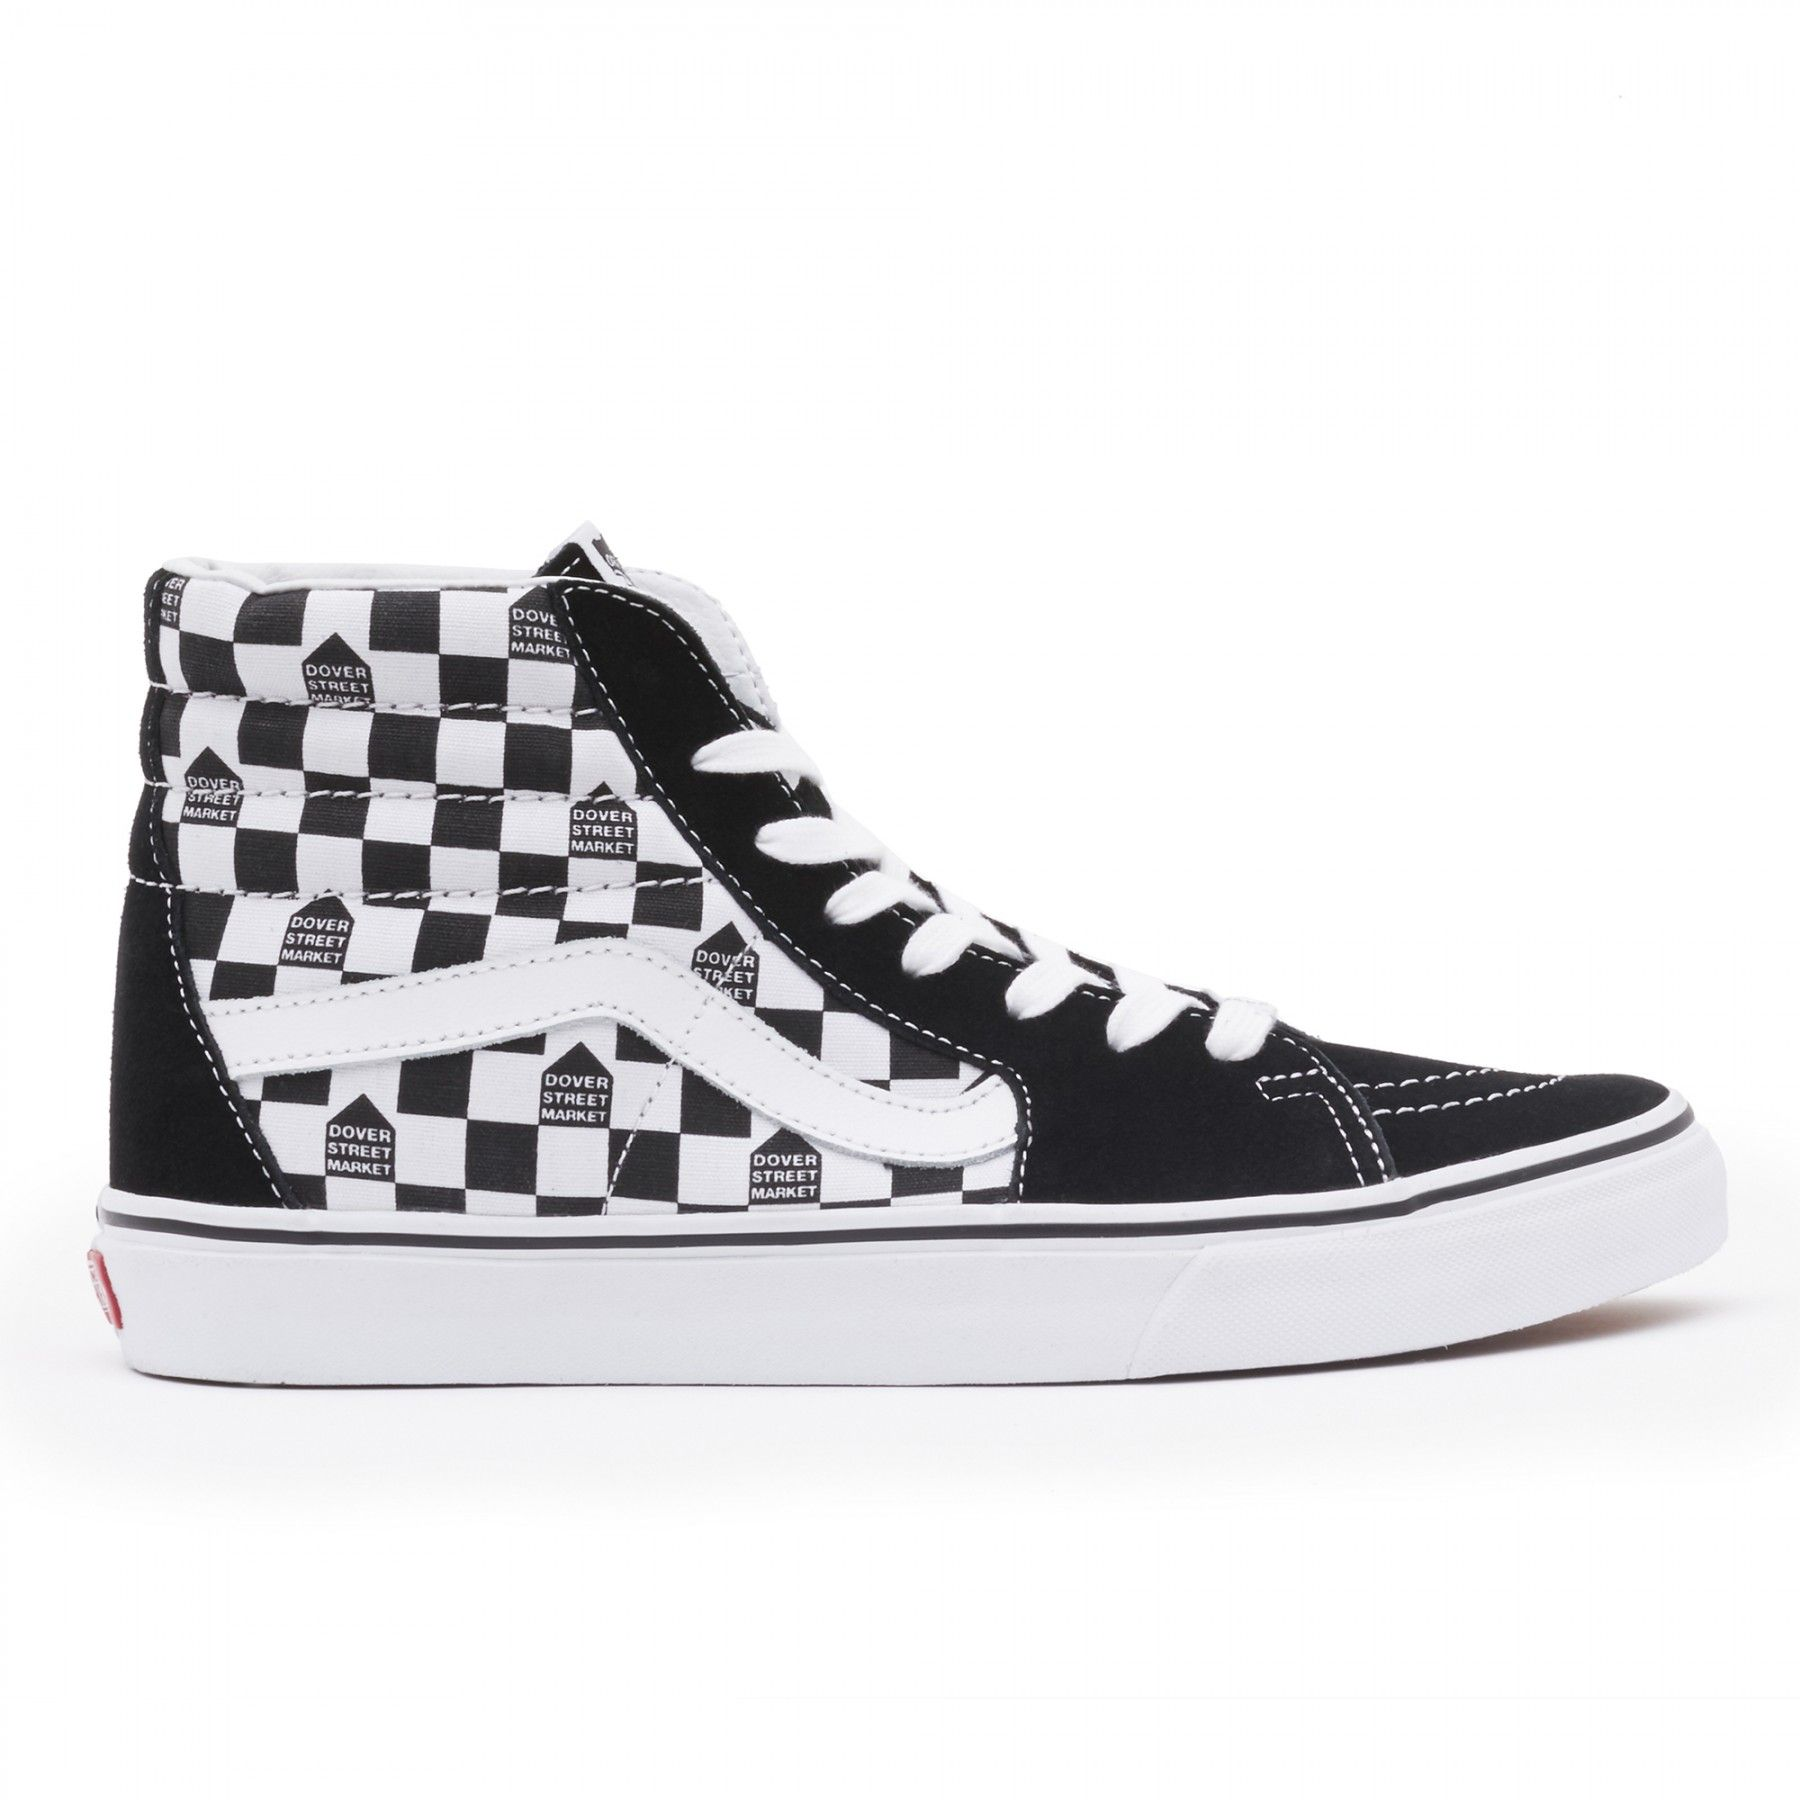 7480aa5bf54 Vans Vault DSM Special Skate Hi (Check)